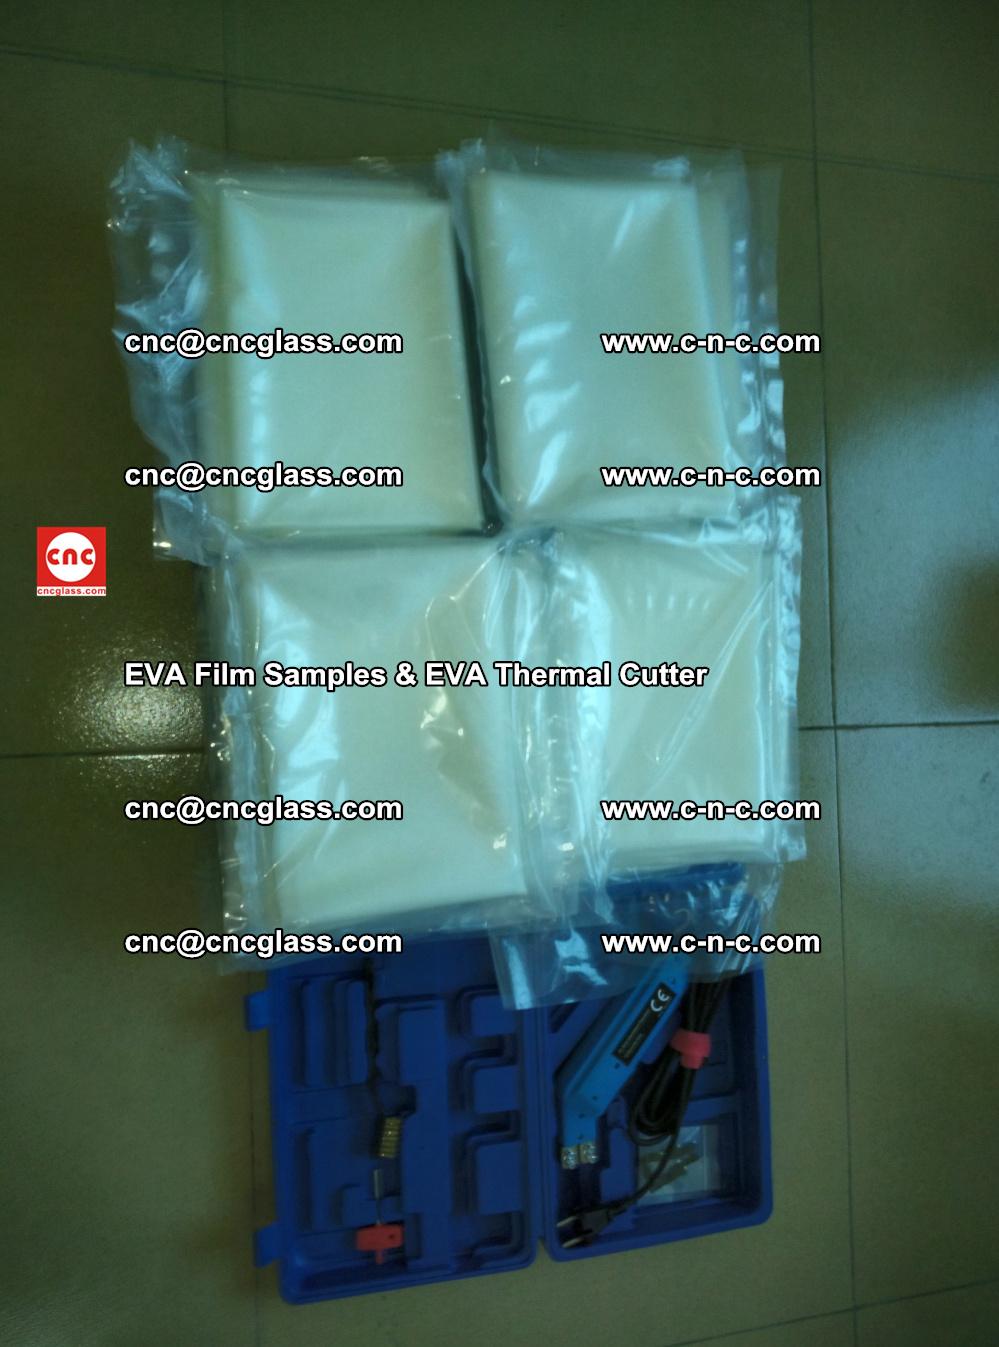 EVAFORCE SUPER CLEAR EVA Film Samples and EVA Thermal Cutter (37)